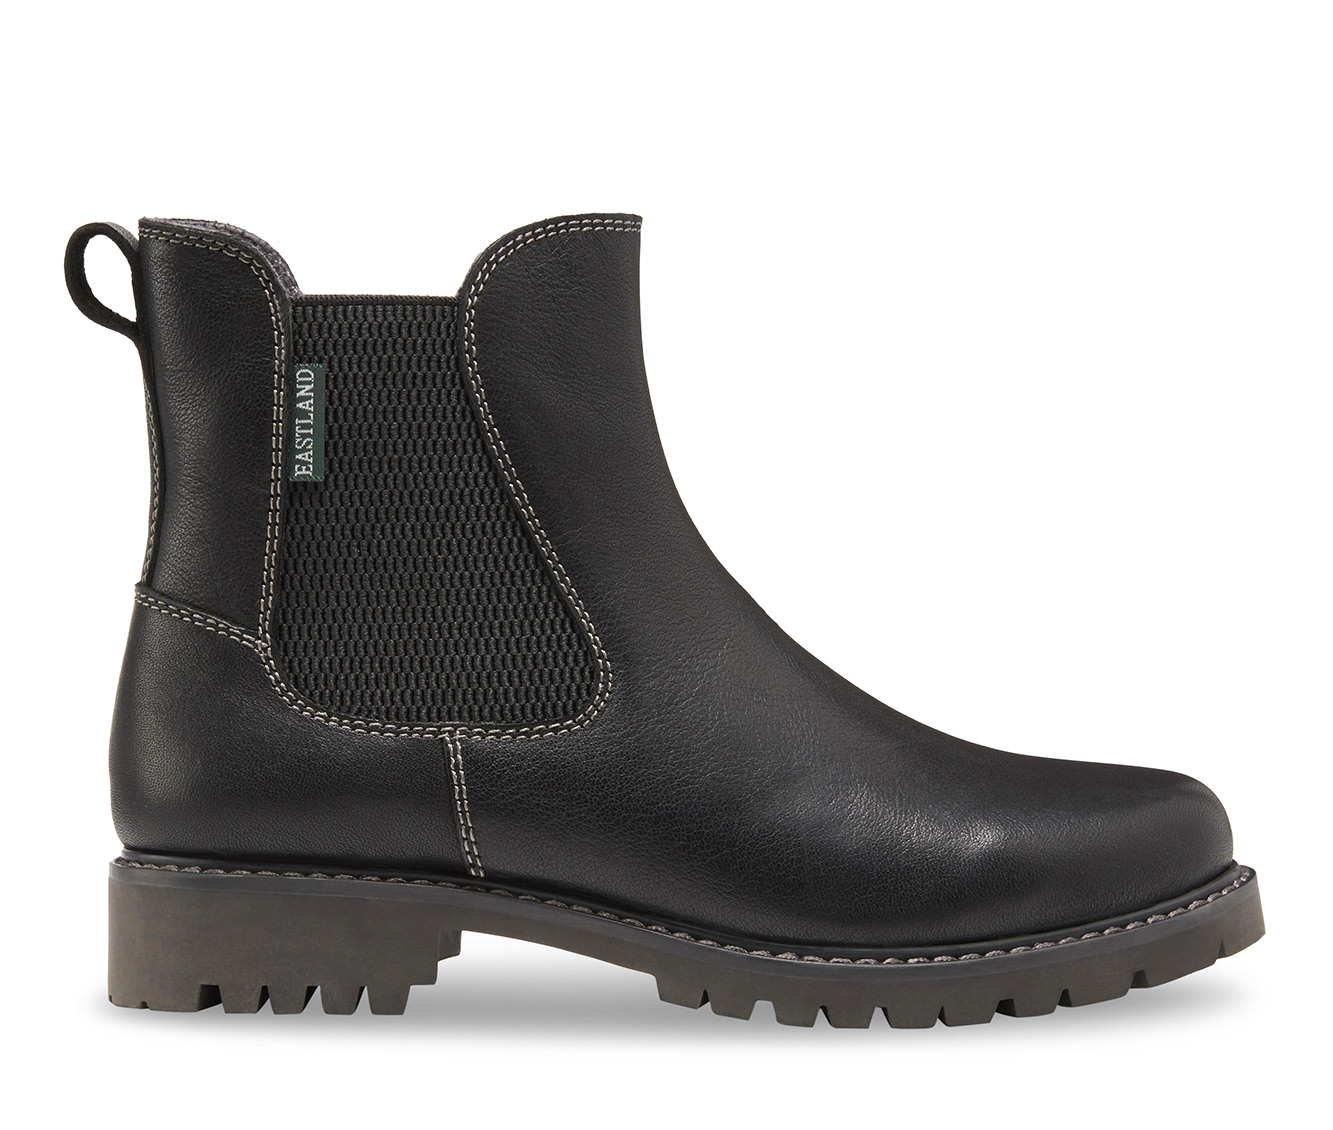 Eastland Ida Women's Boots (Black - Leather)